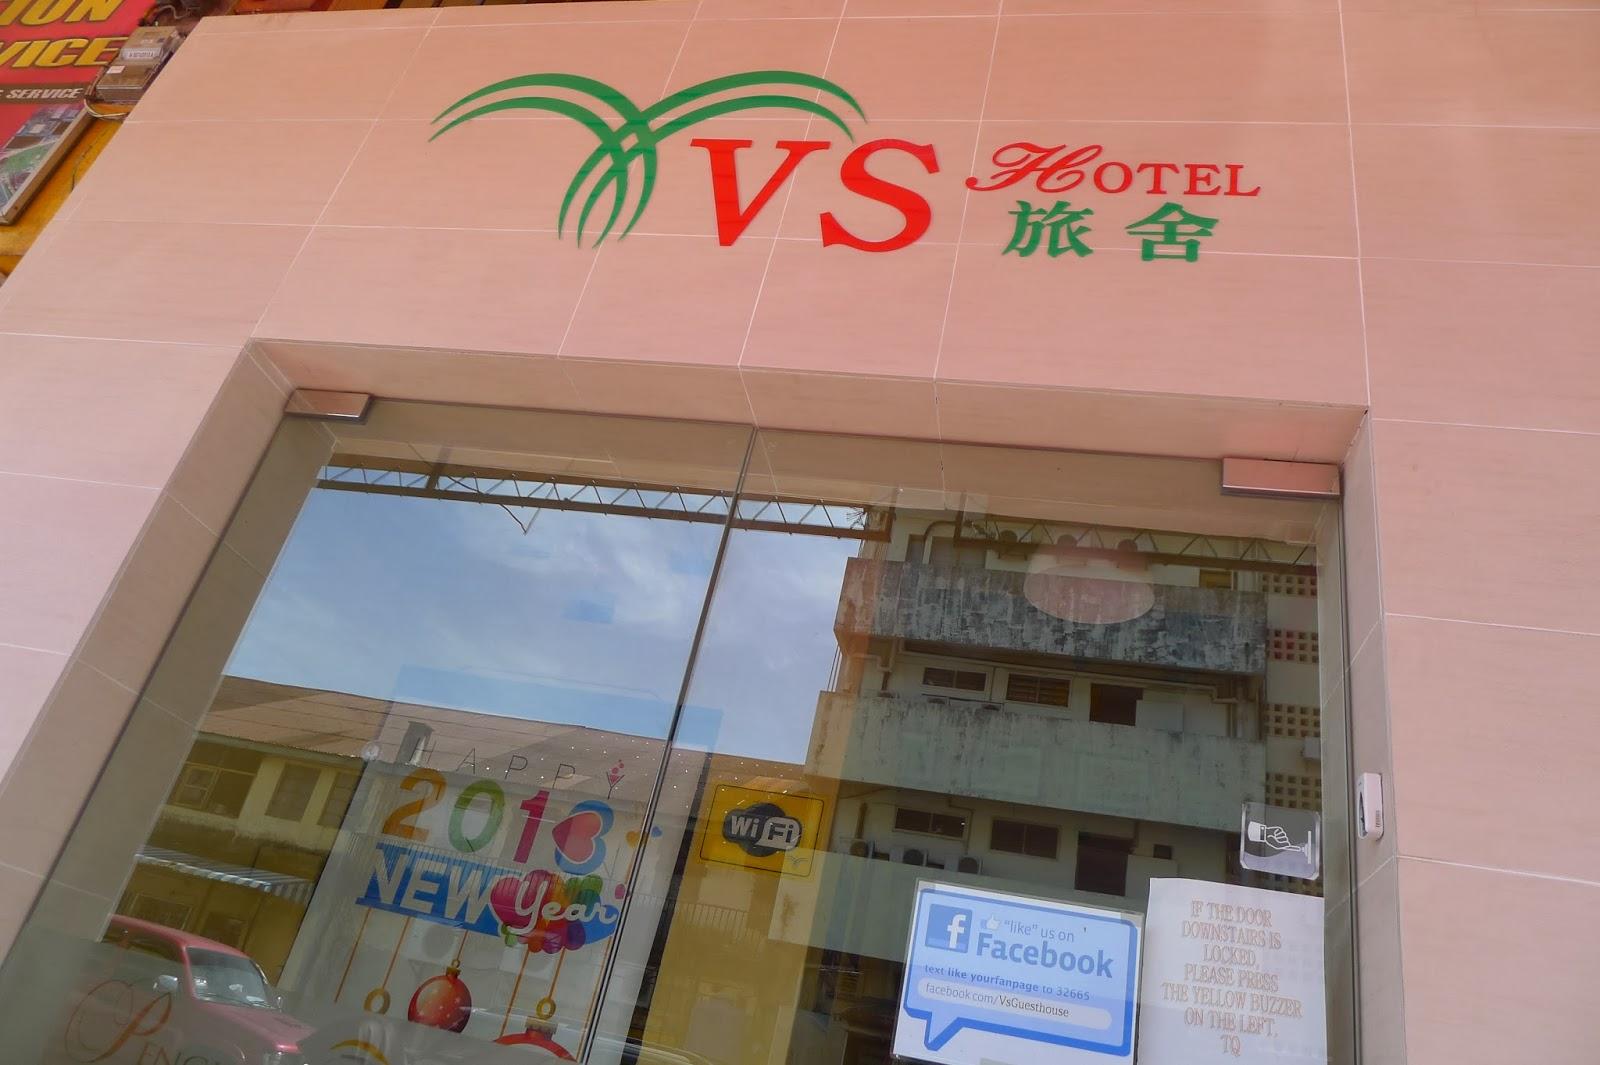 Setel Meletak Barang Di Dalam Bilik Aku Dan Cik L Terus Keluar Dari Hotel Menuju Ke Tempat Makan Tingkat Atas Banggunan Pasar Gantung